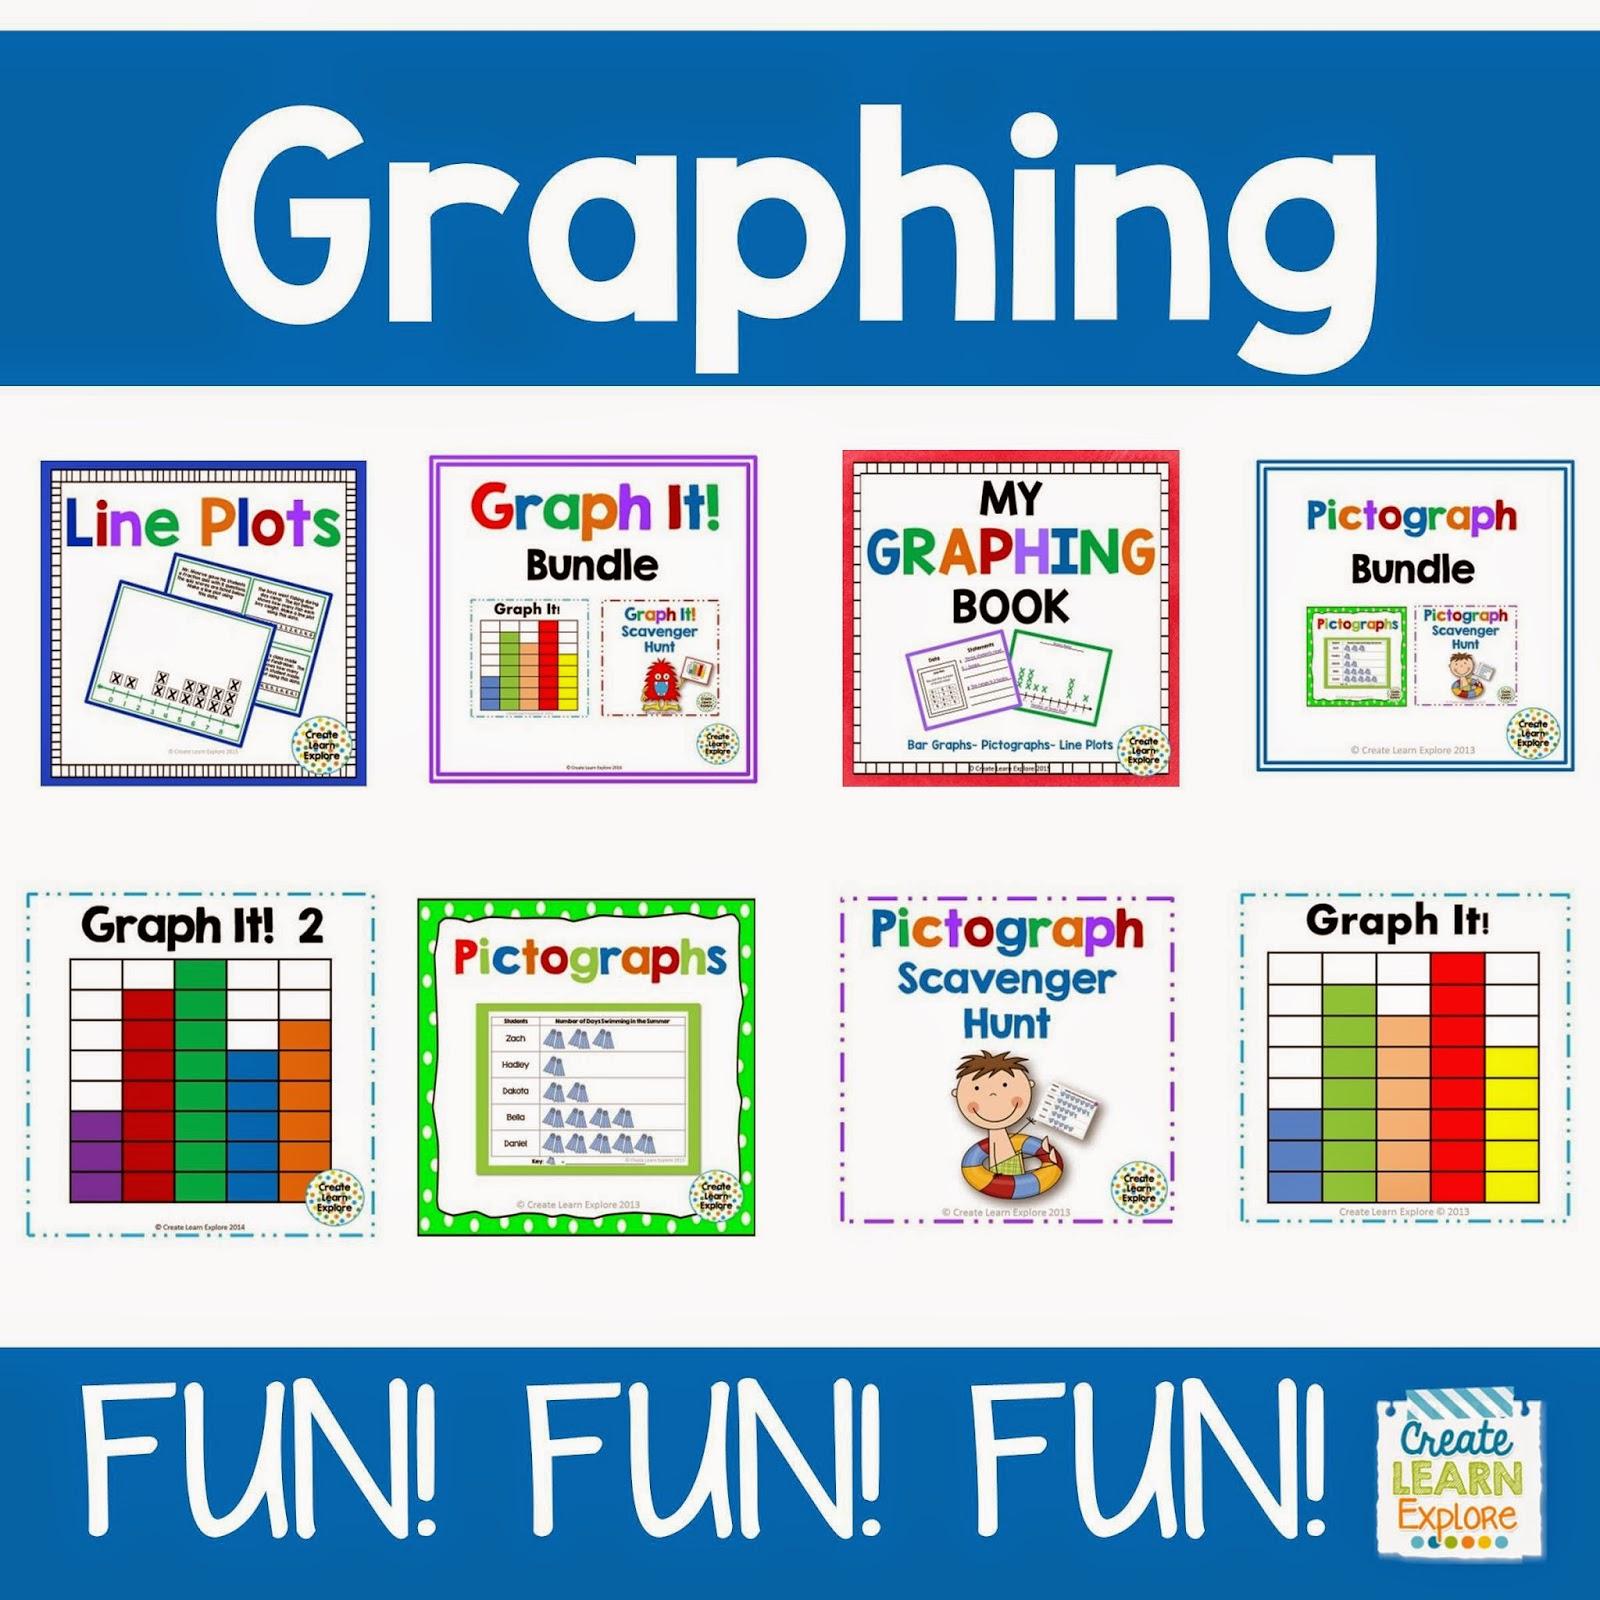 https://www.teacherspayteachers.com/Store/Create-Learn-Explore